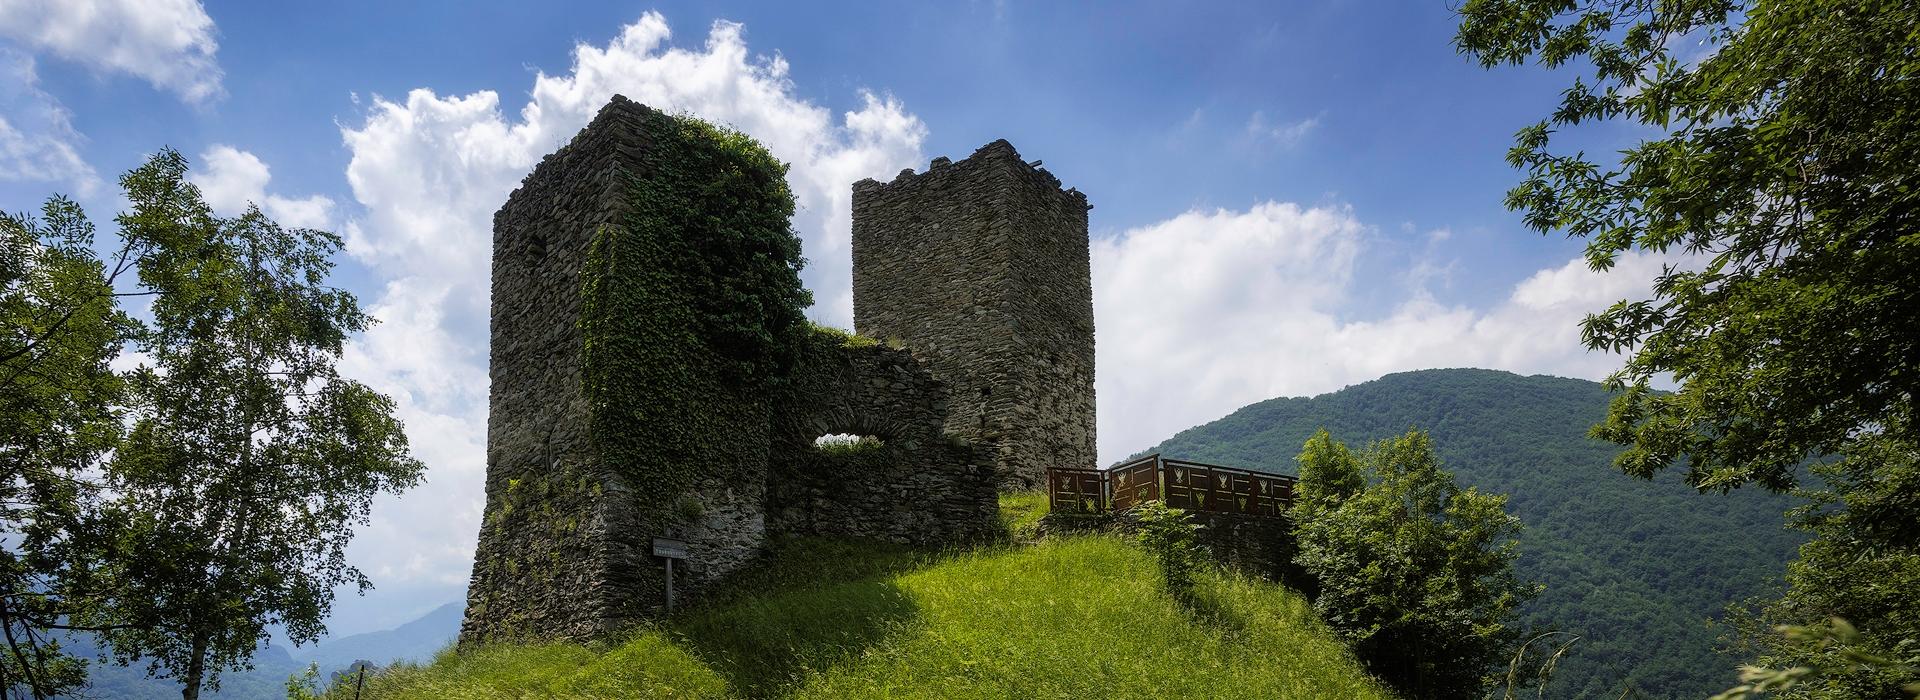 Castello Tourusela